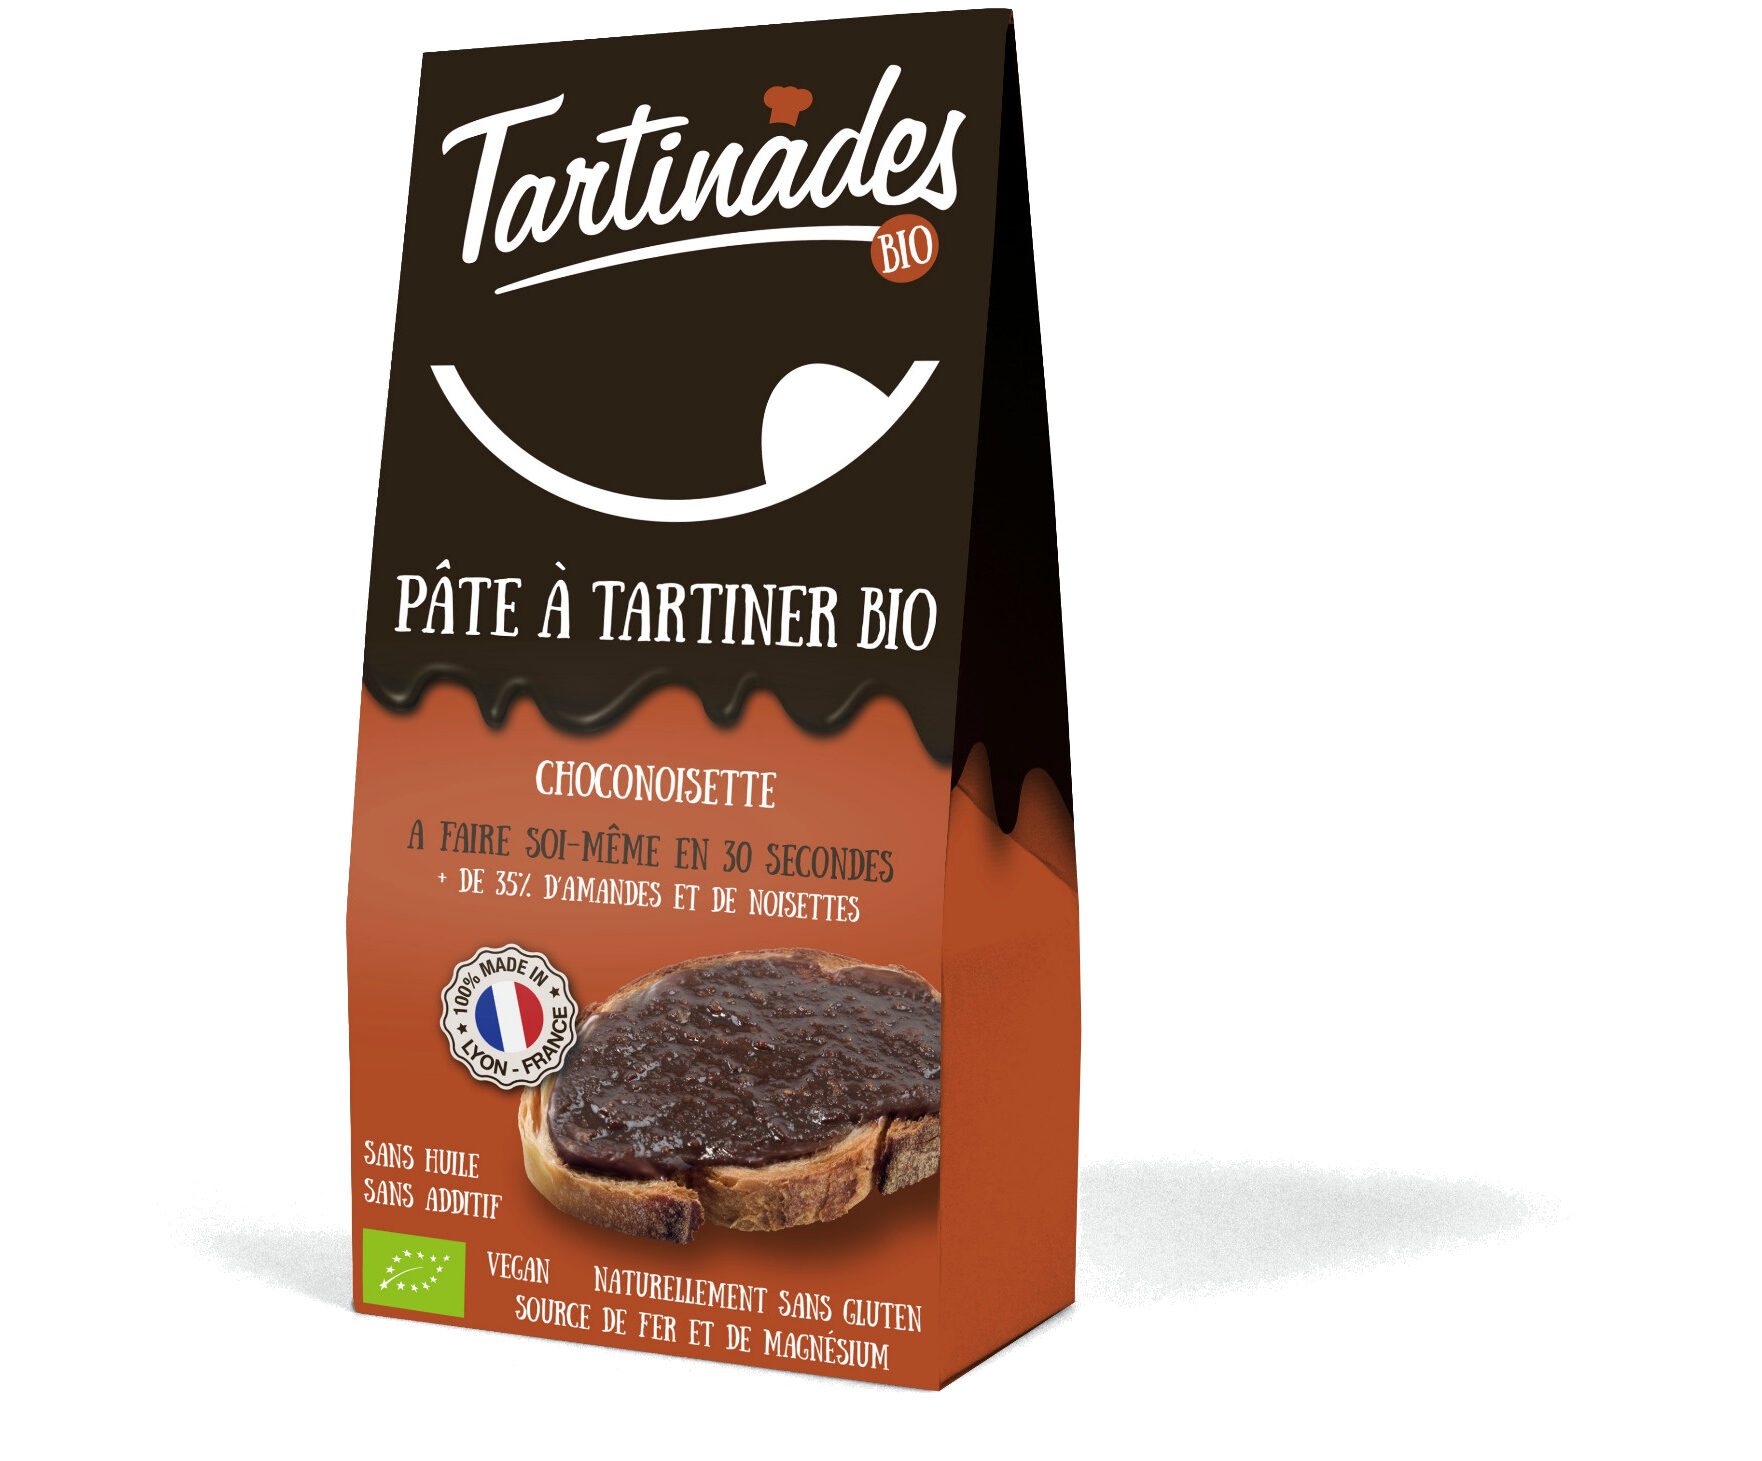 Tartinades Choconoisette - Product